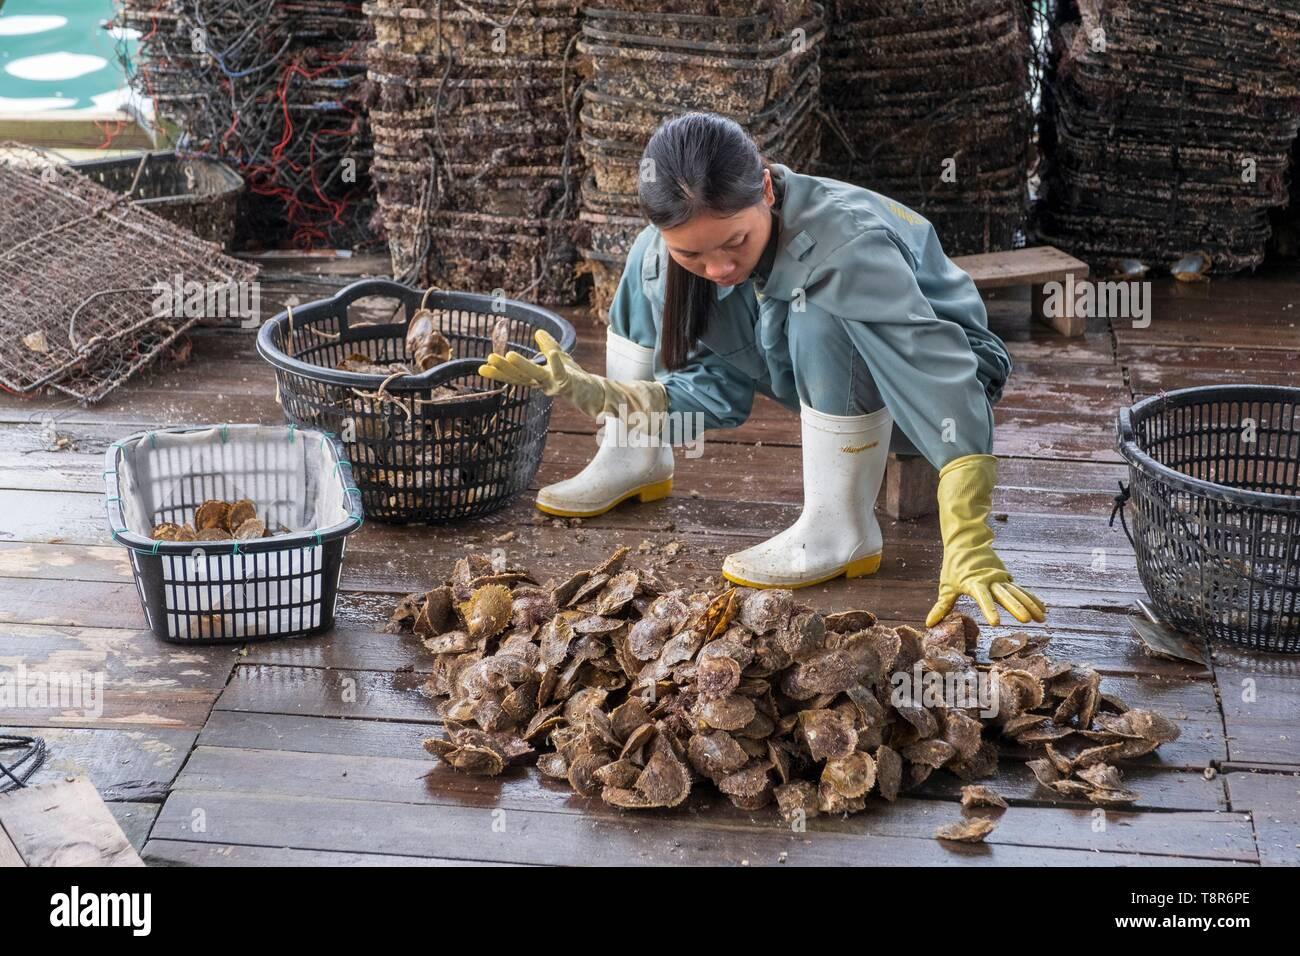 Vietnam, Gulf of Tonkin, Quang Ninh province, Ha Long Bay (Vinh Ha Long), Akoya, Tahitian and Southsea cultured pearls, sorting oysters Stock Photo